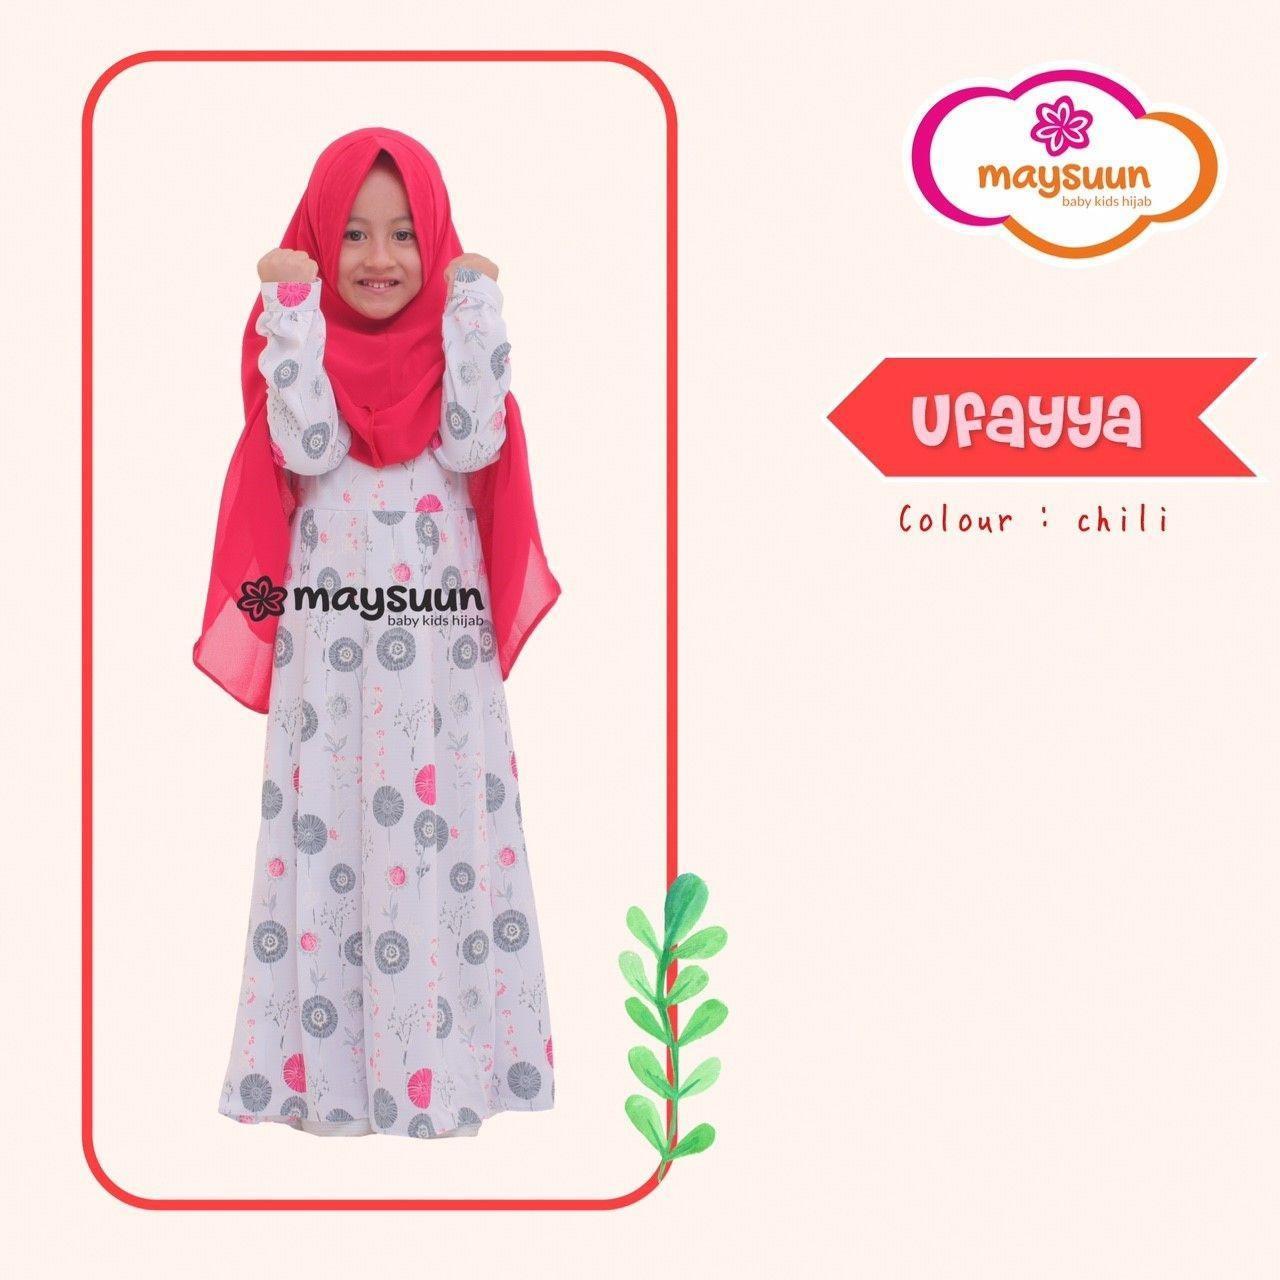 TERLUCU !, Fairuz HIjab, Baju Gamis Anak Perempuan syari, Baju Muslim Anak Branded Murah Warna Merah , Uffaya Series